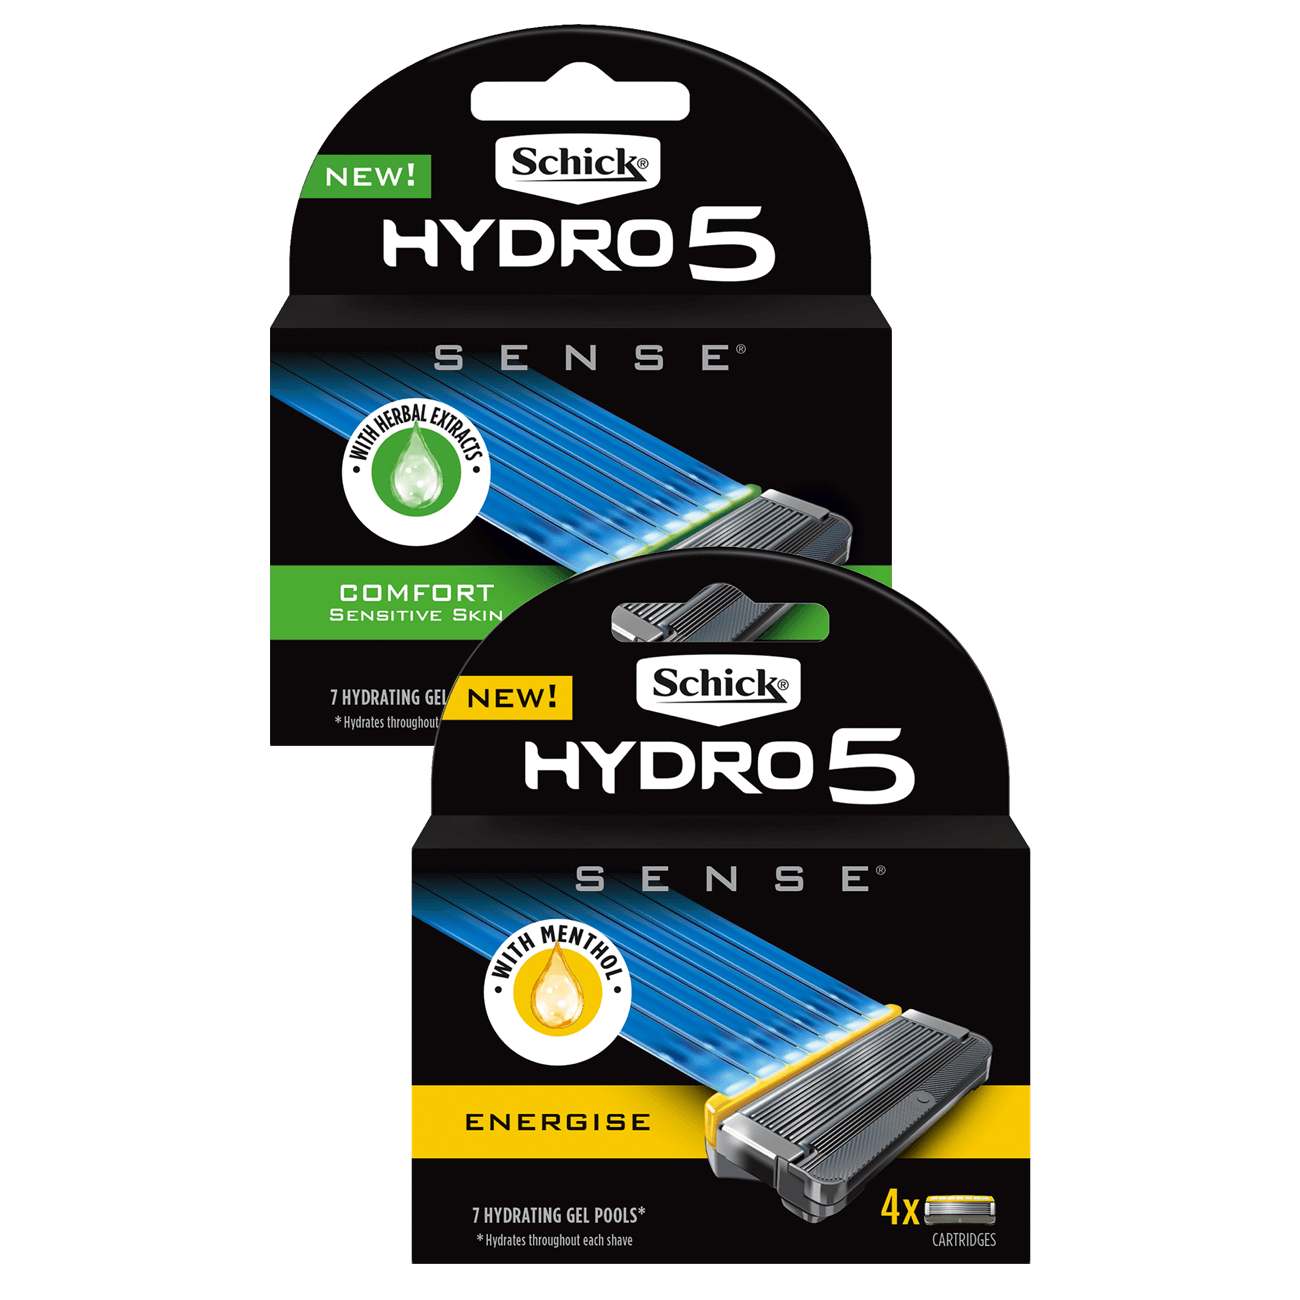 Hydro 5 Sense™ Blade Refills